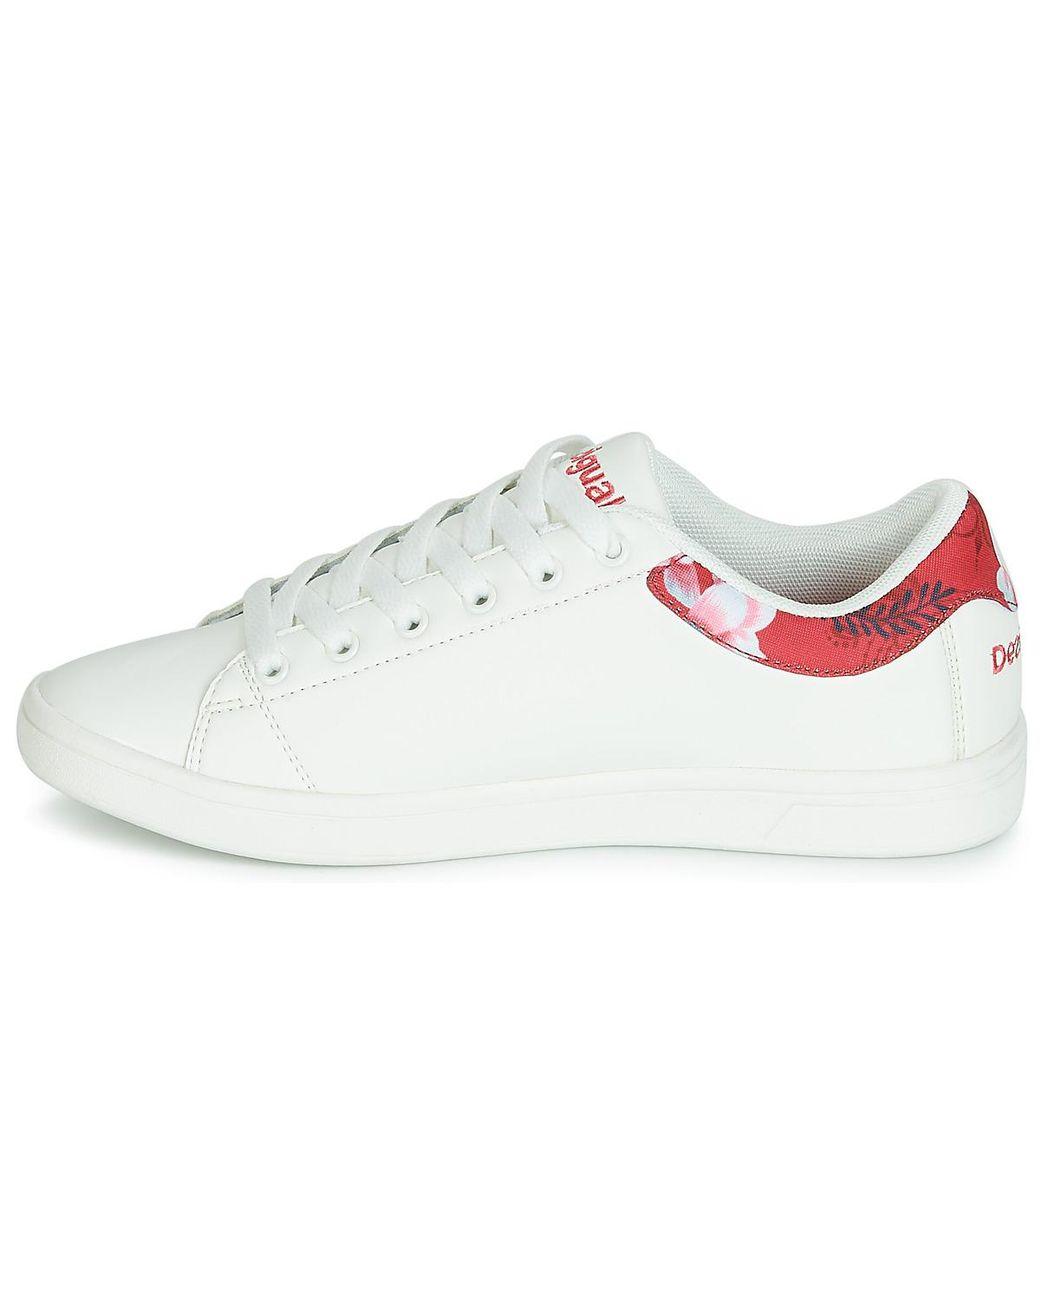 Women's ShoestrainersIn White Hindi Desigual Dancer Tennis T3KuJc1lF